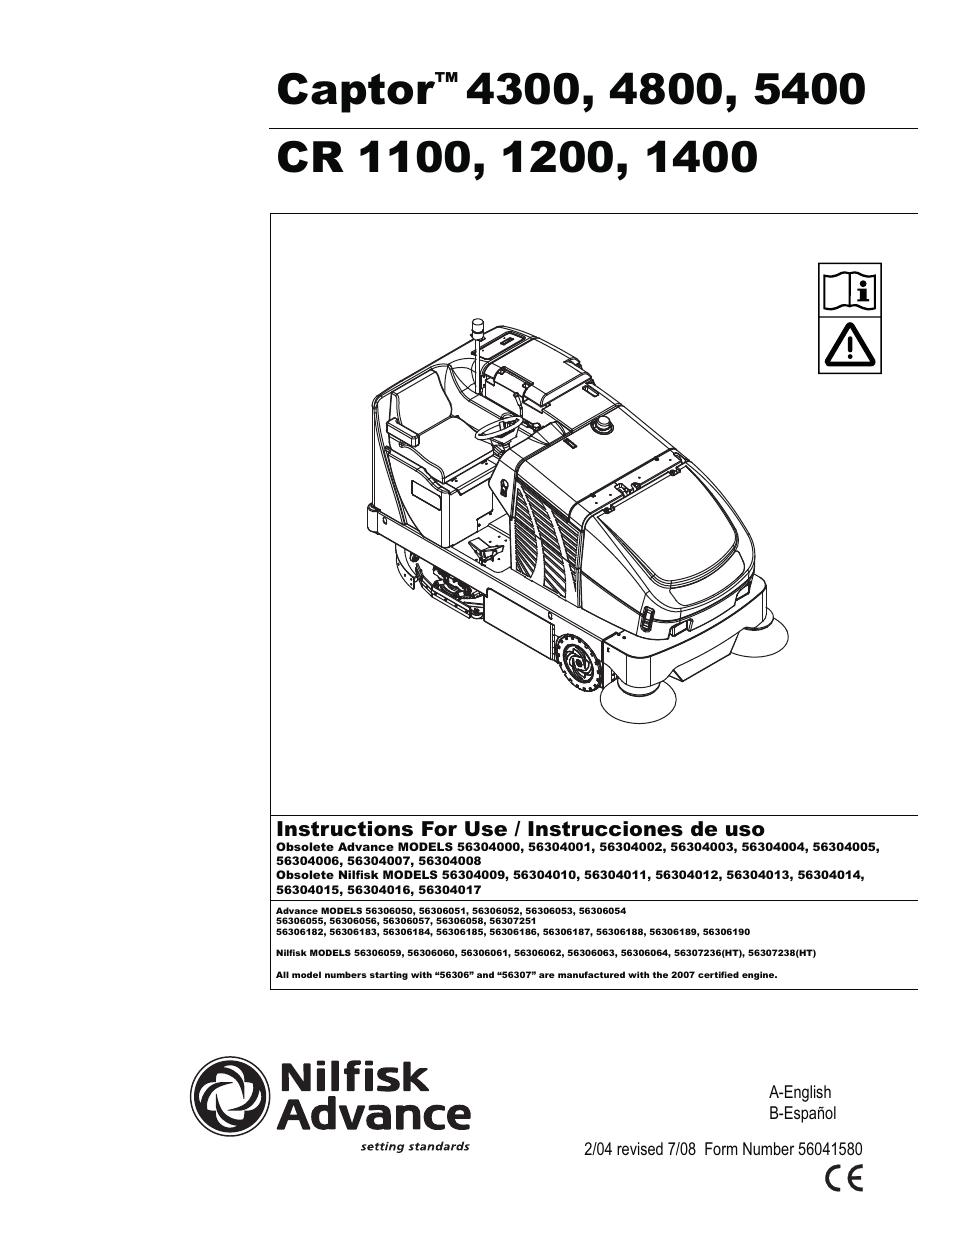 Advance captor 4300 4800 5400 accessories parts list manual | auto.